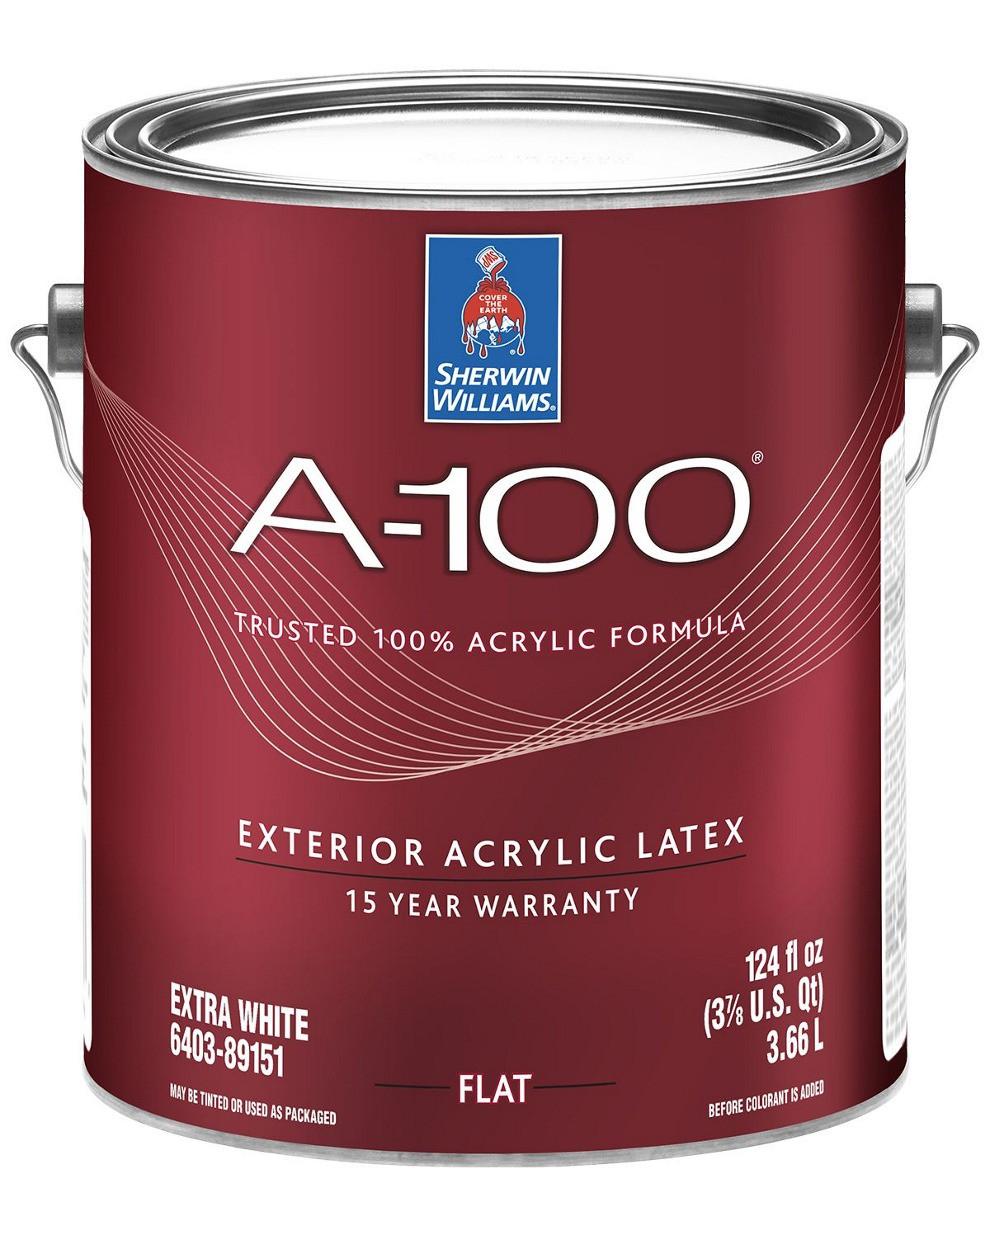 Краска A-100 Sherwin-Williams глубокоматовая фасадная экстра белая, 3,66л (шервин вильямс a-100)